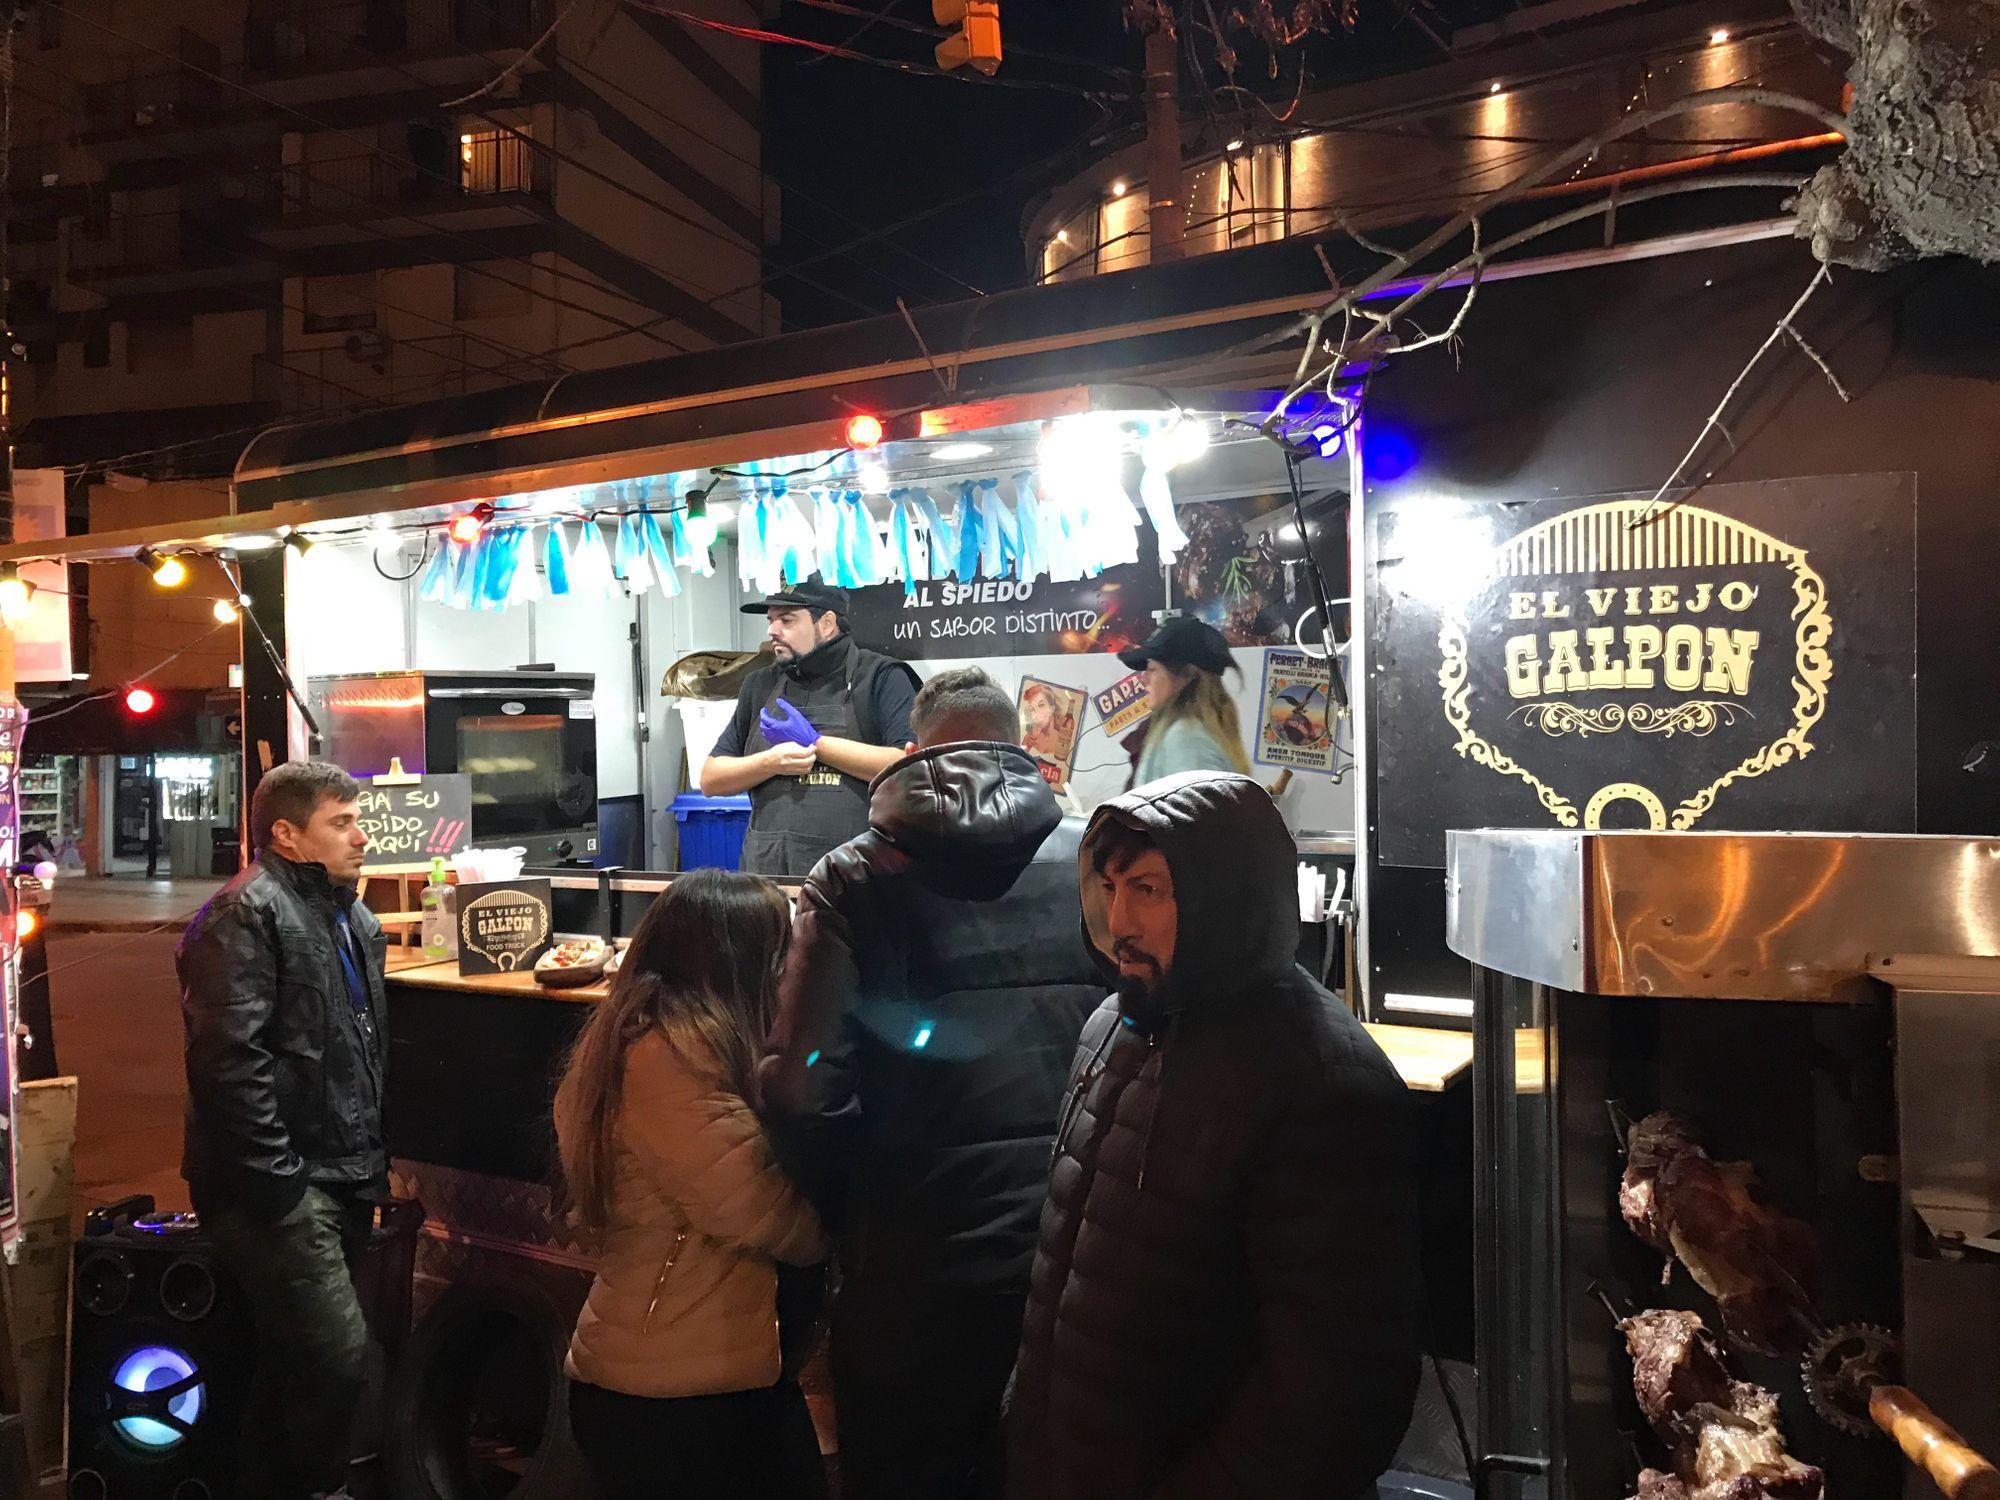 El Viejo Galpón: Mi favorito en Caravana Food Trucks